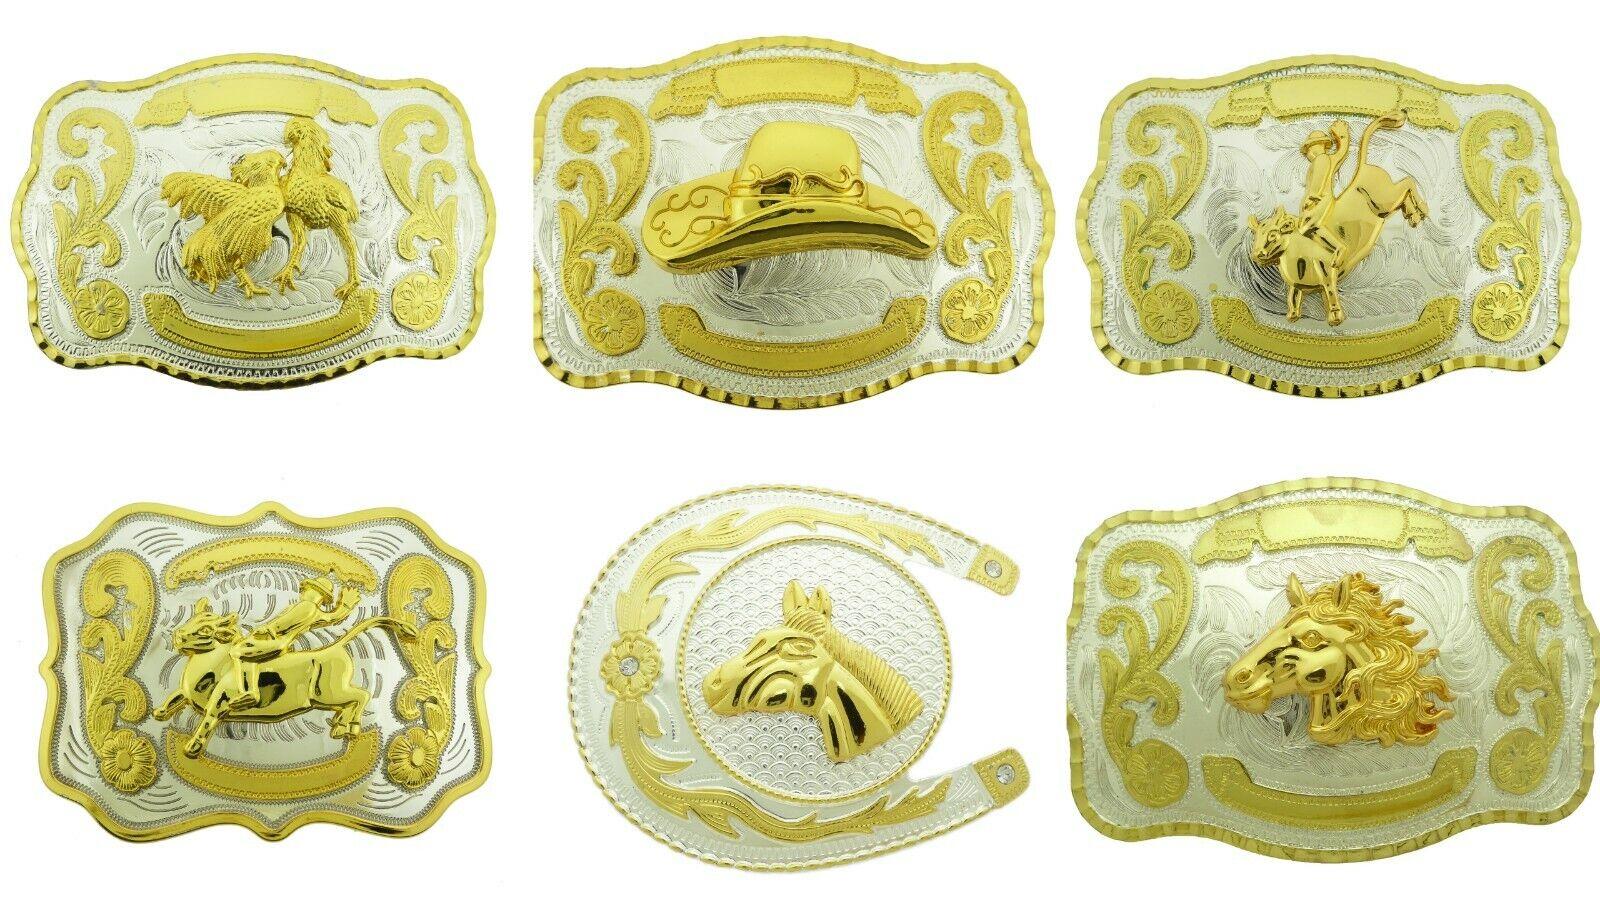 3D Herren Western Gürtelschnalle Hahn Rodeo Skorpion Kampf Mexikaner Texas Style